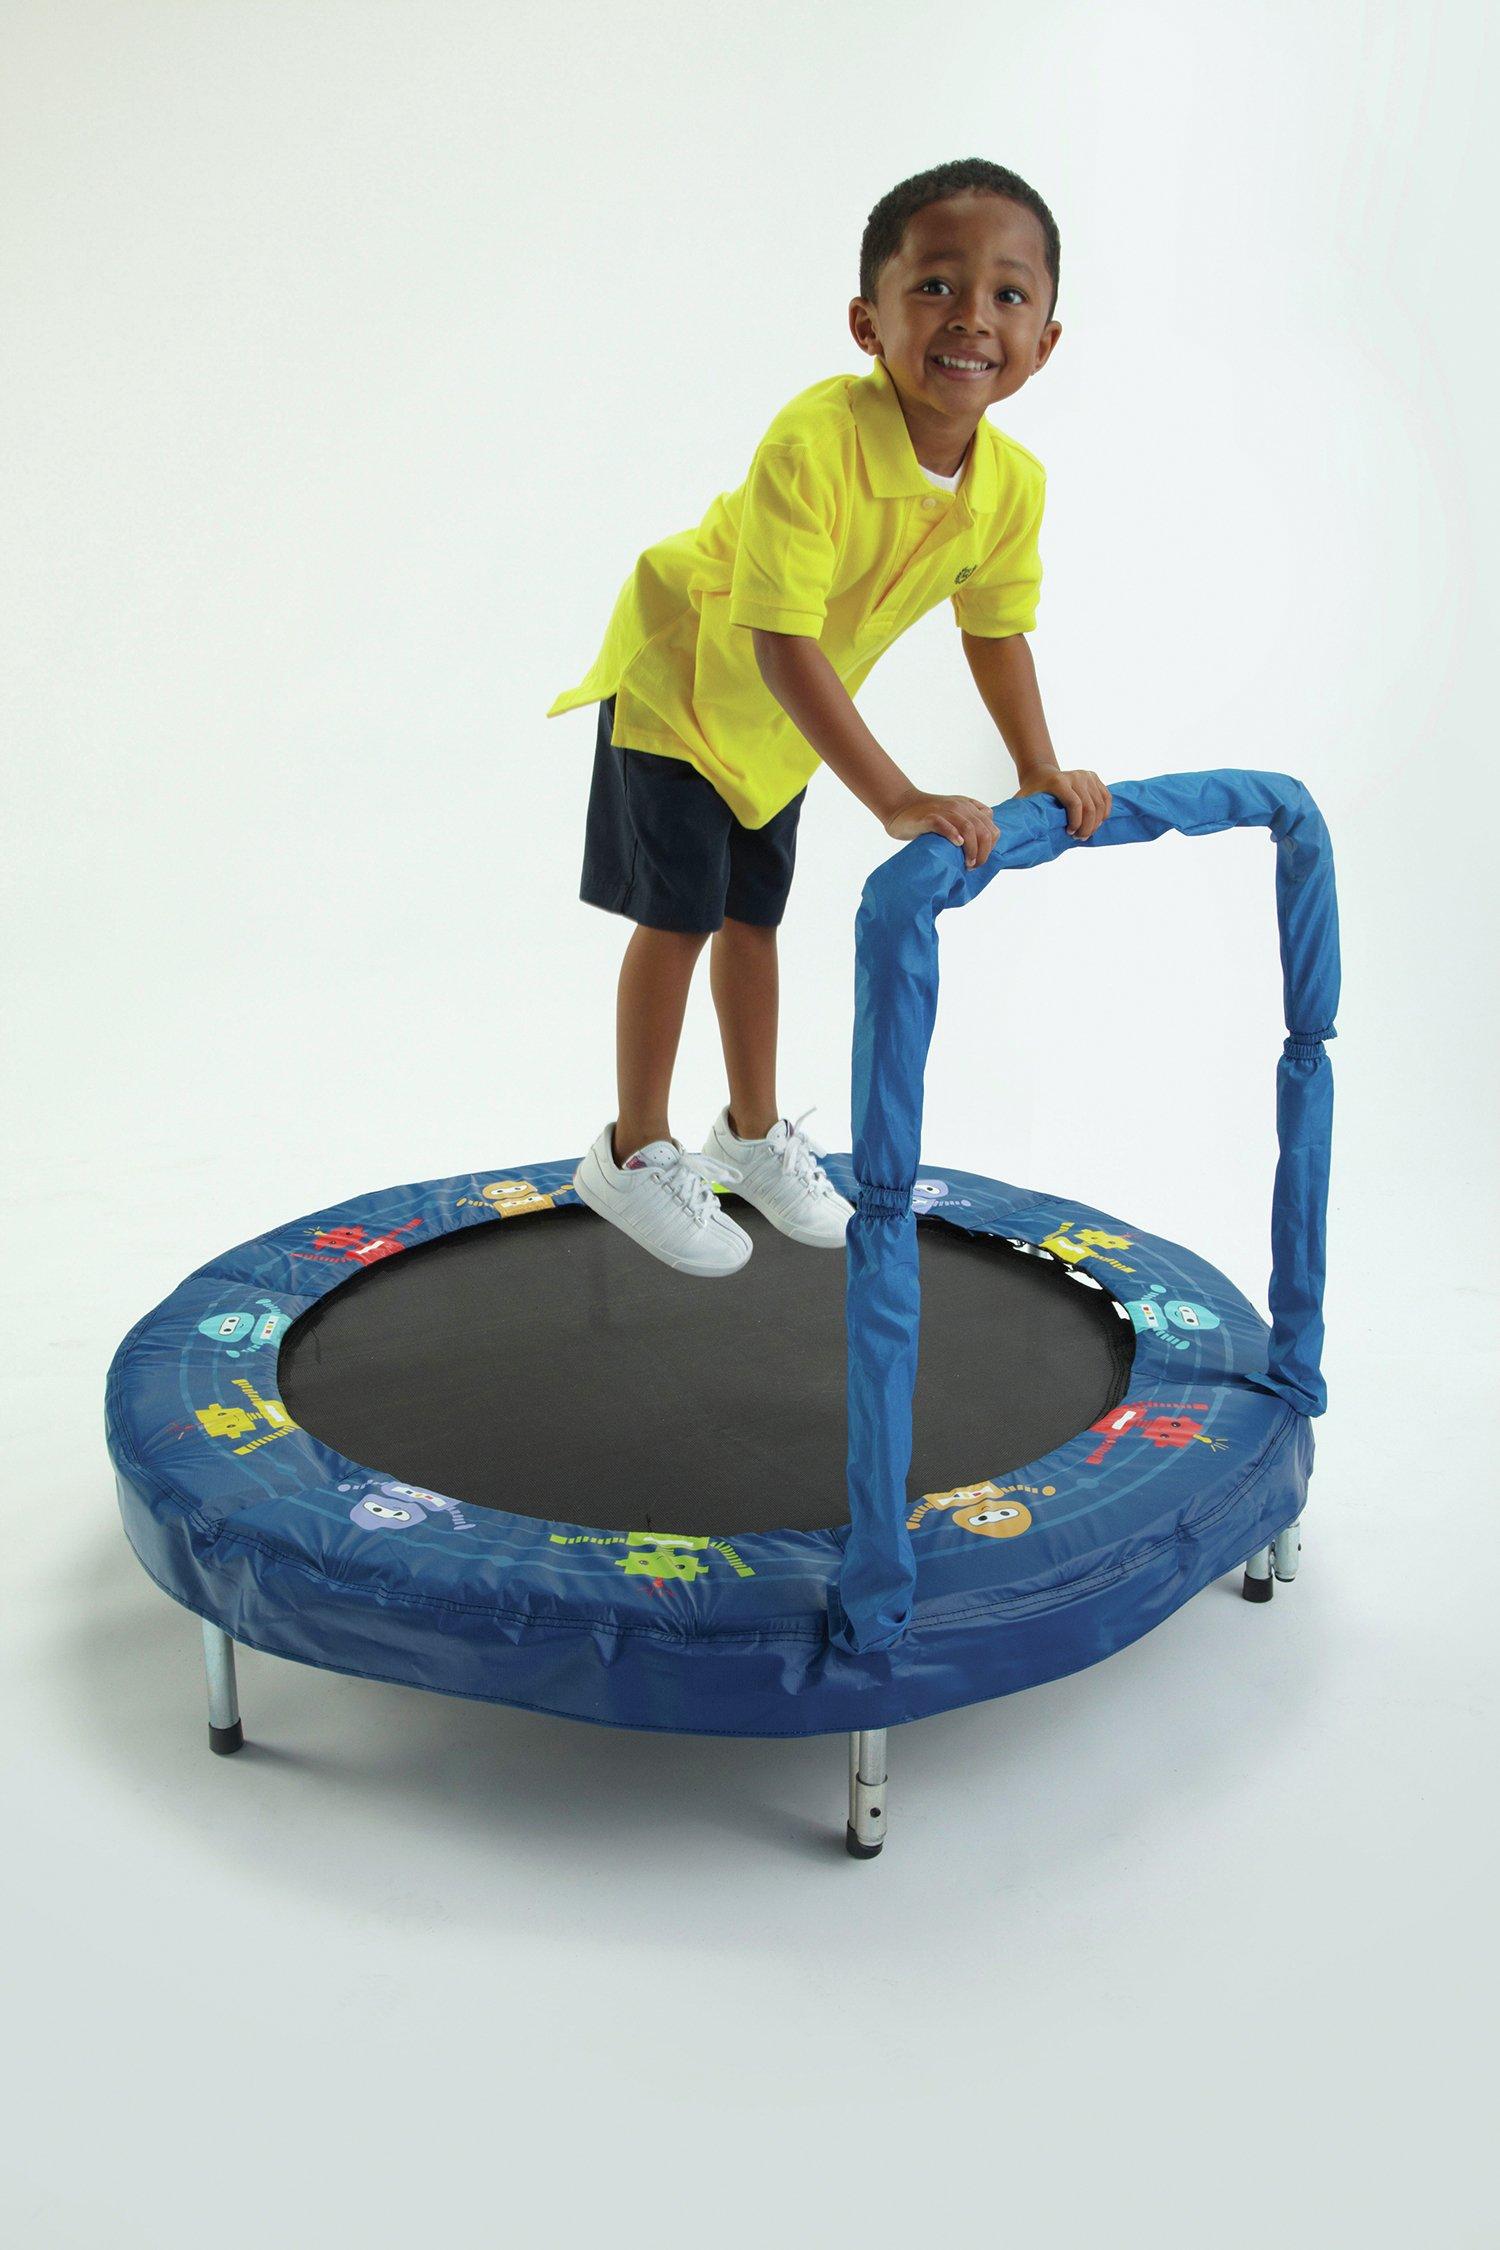 Jumpking 48 Inch Junior Trampoline   Robot Bouncer.